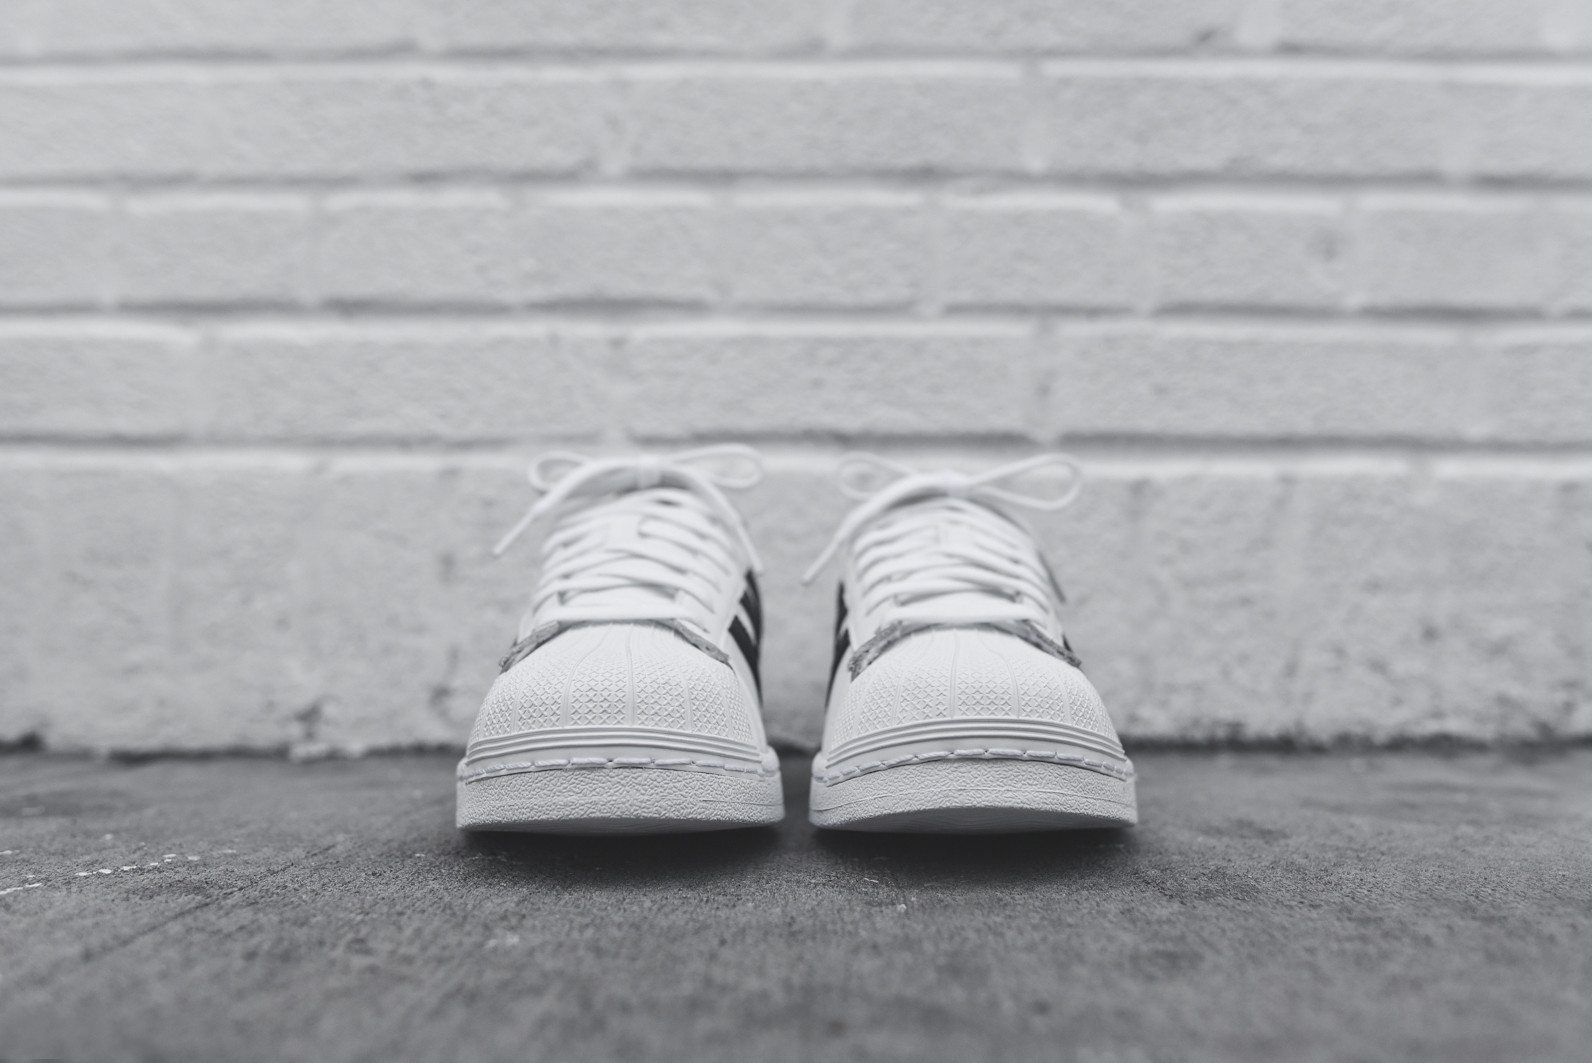 adidas Originals Superstar White Black 4